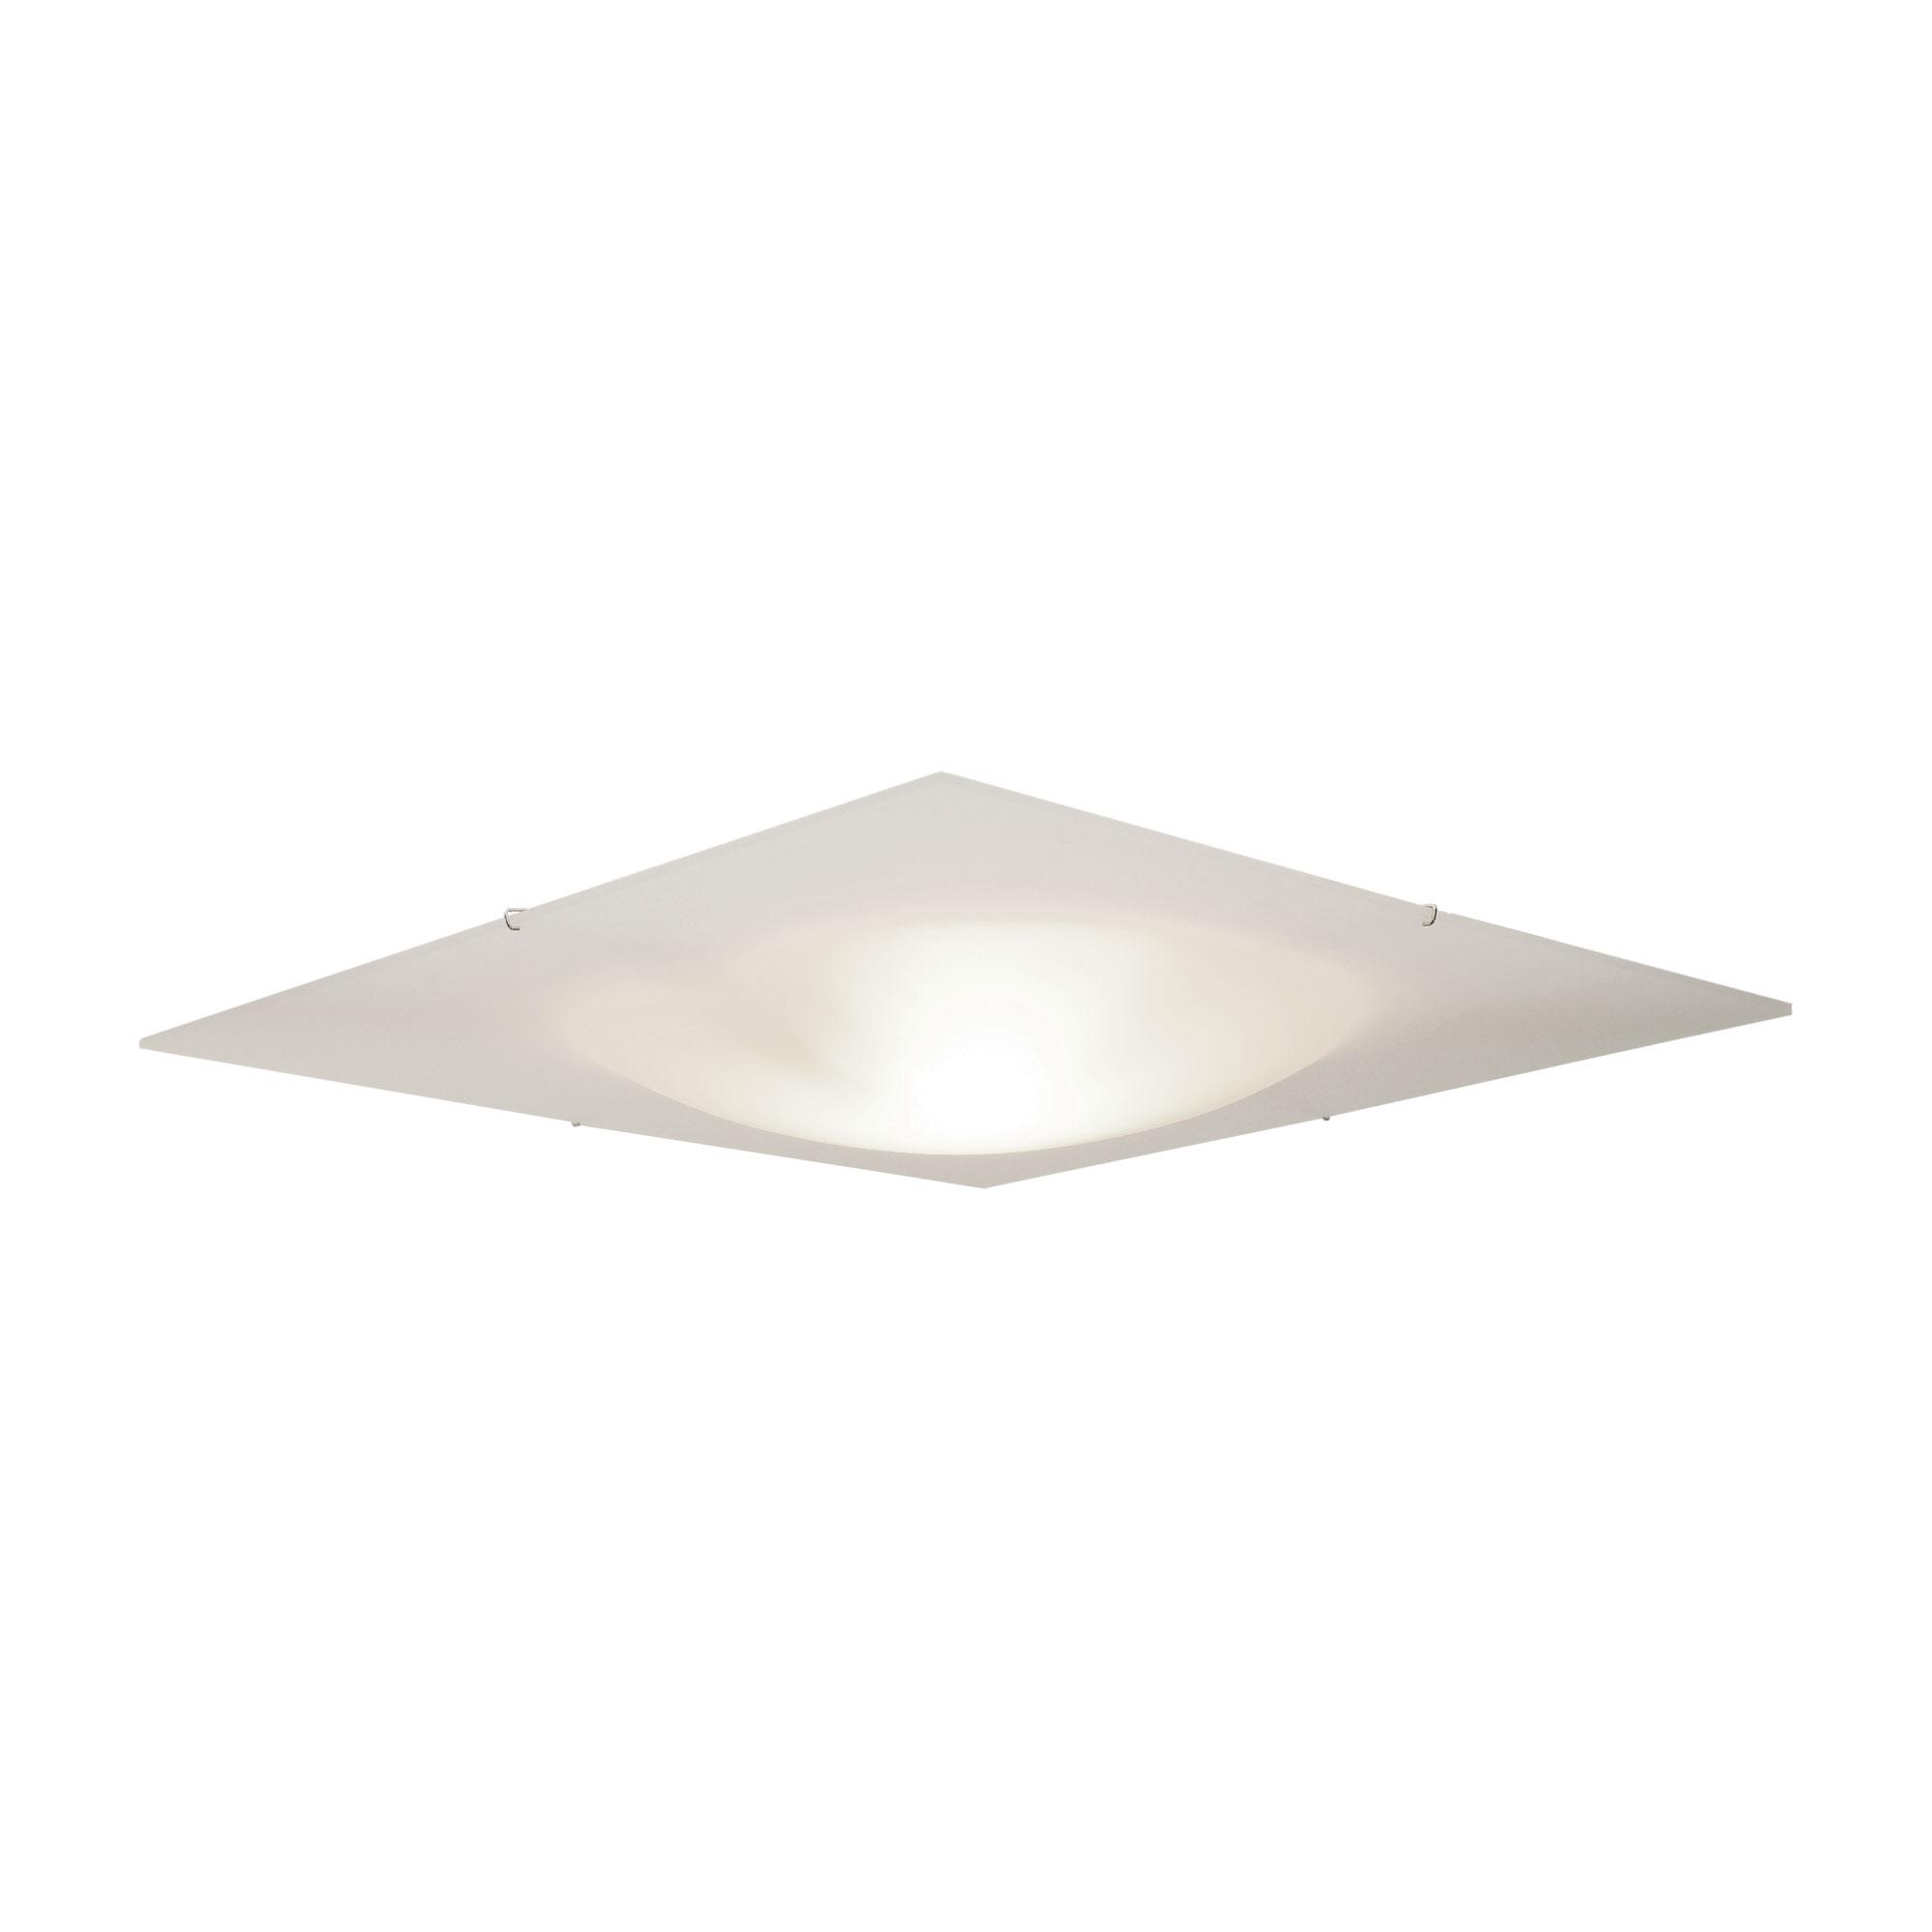 Xenon Ceiling Lights : Vanilla sky square xenon ceiling flush mount by edge